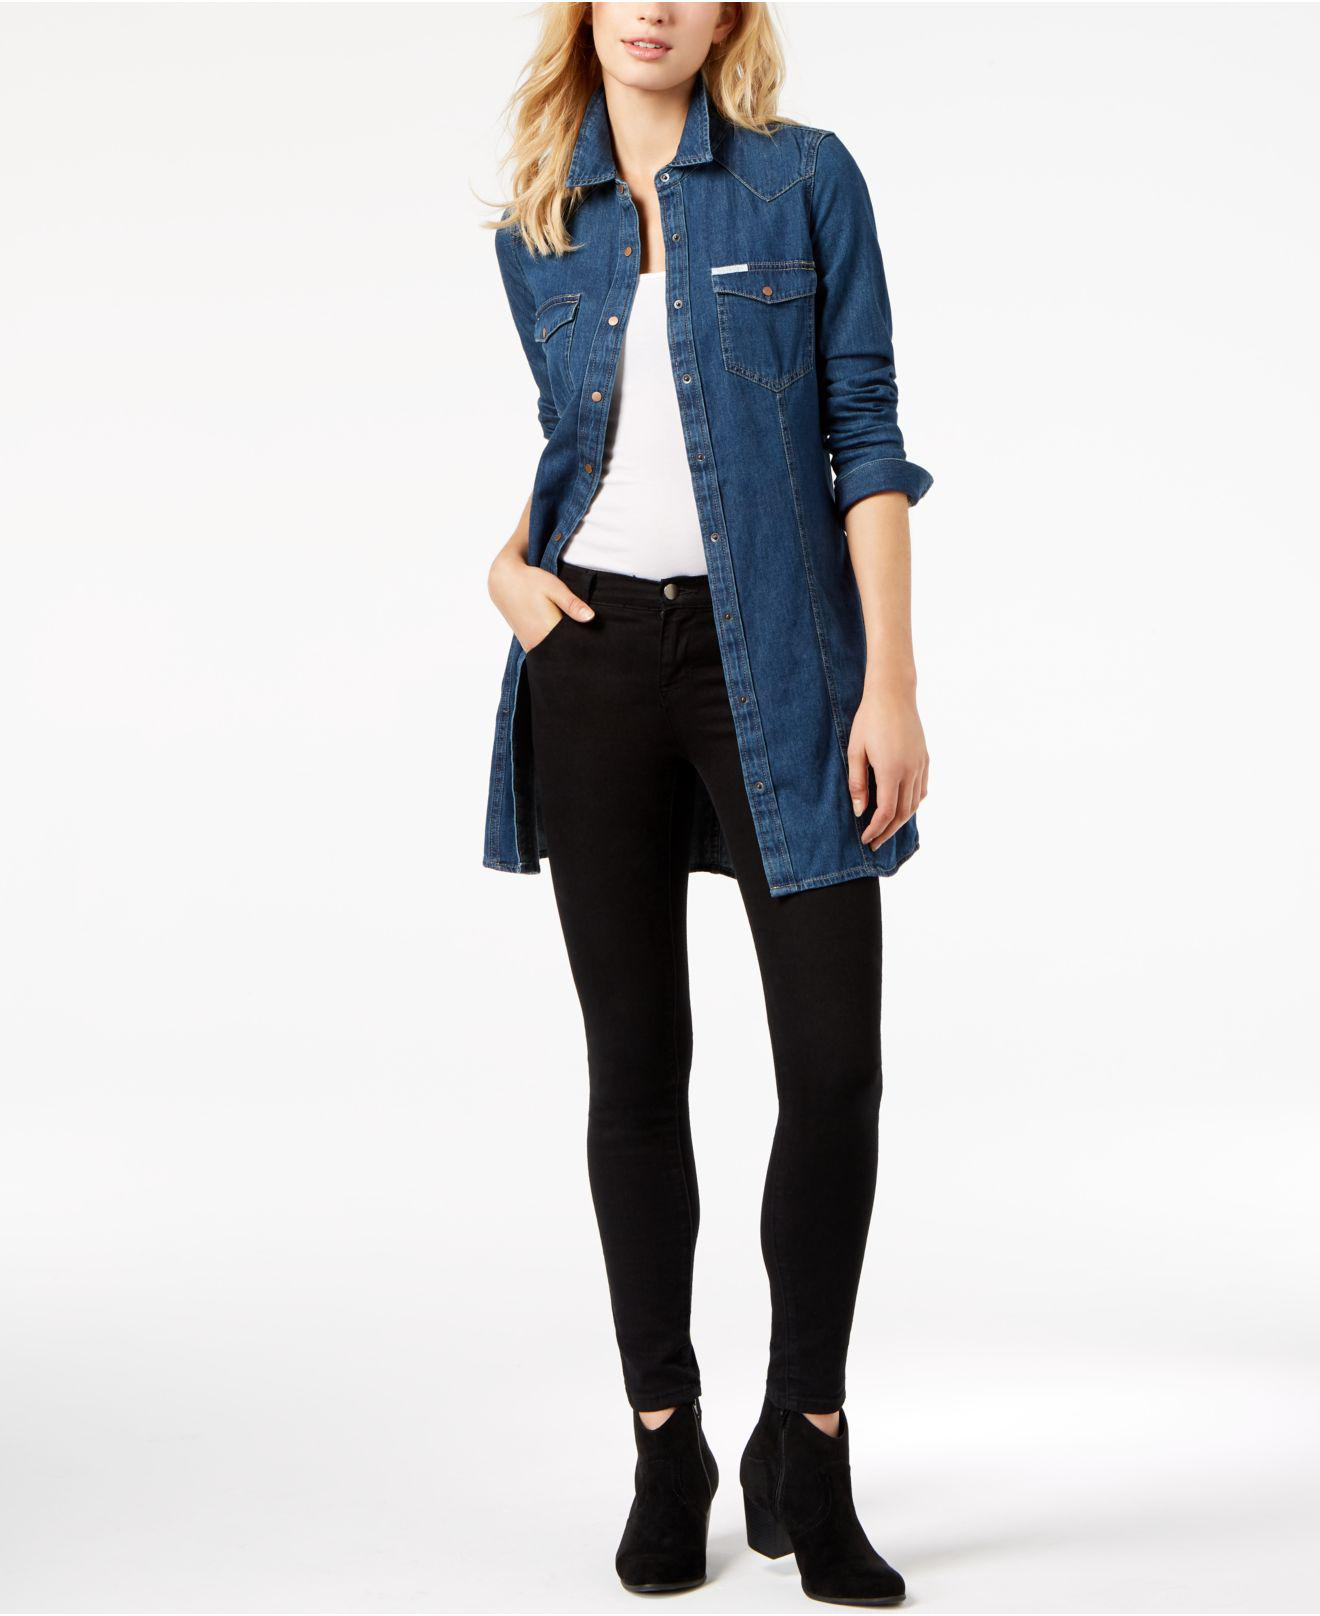 b7c76381e00 Lyst - Calvin Klein Retro Luxe Cotton Denim Shirtdress in Blue